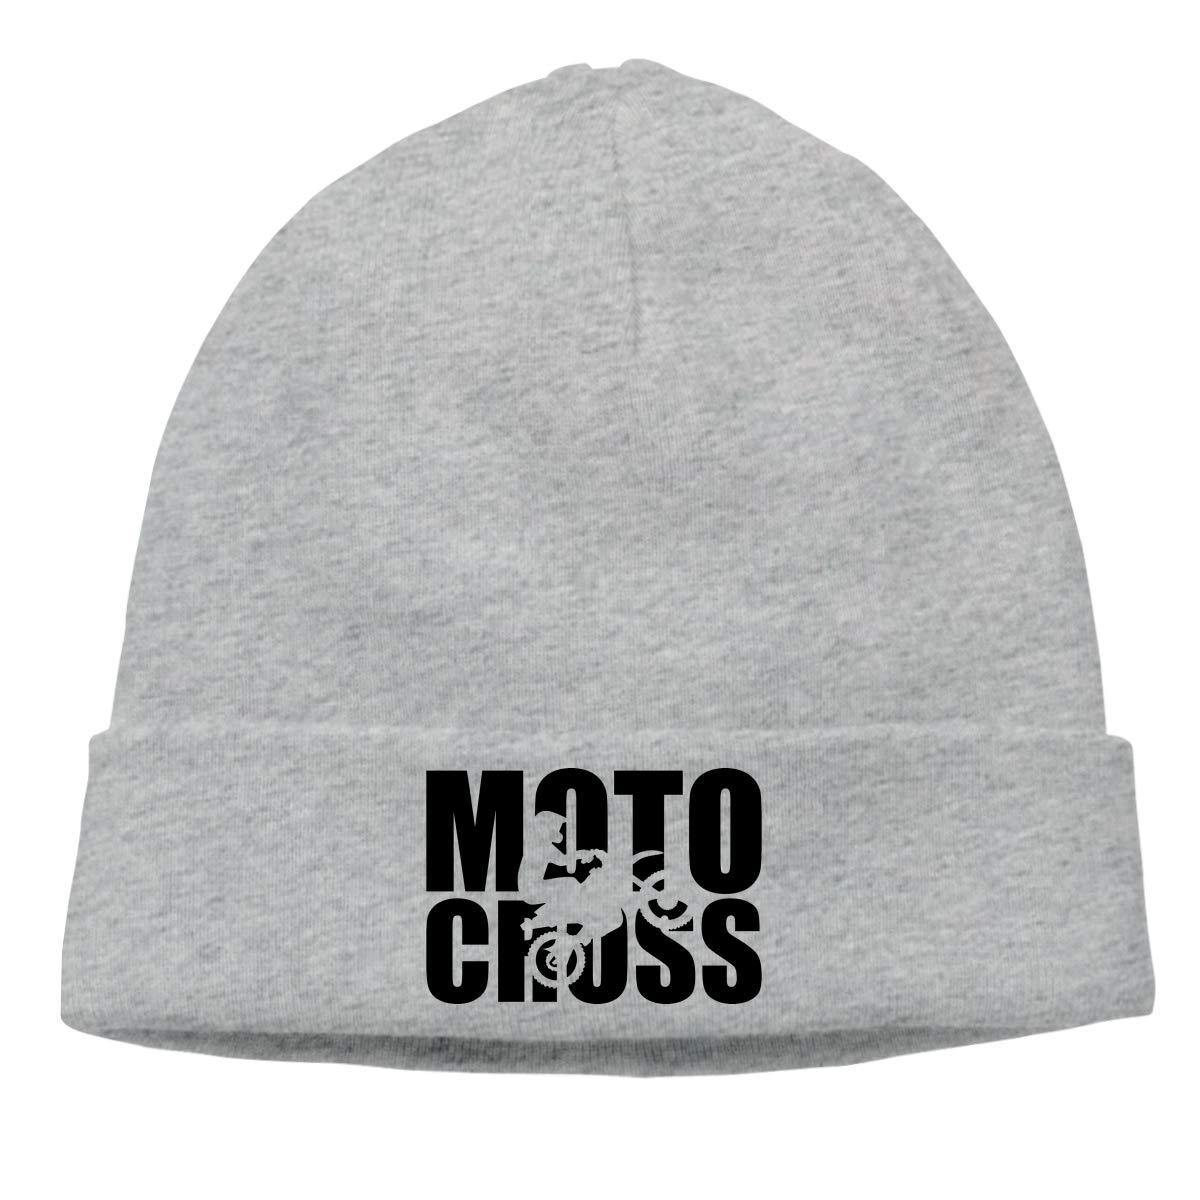 Nskngr Motocross Evolution Cap Unisex Cuffed Chunky Beanie Hats Slouchy Beanie Hat